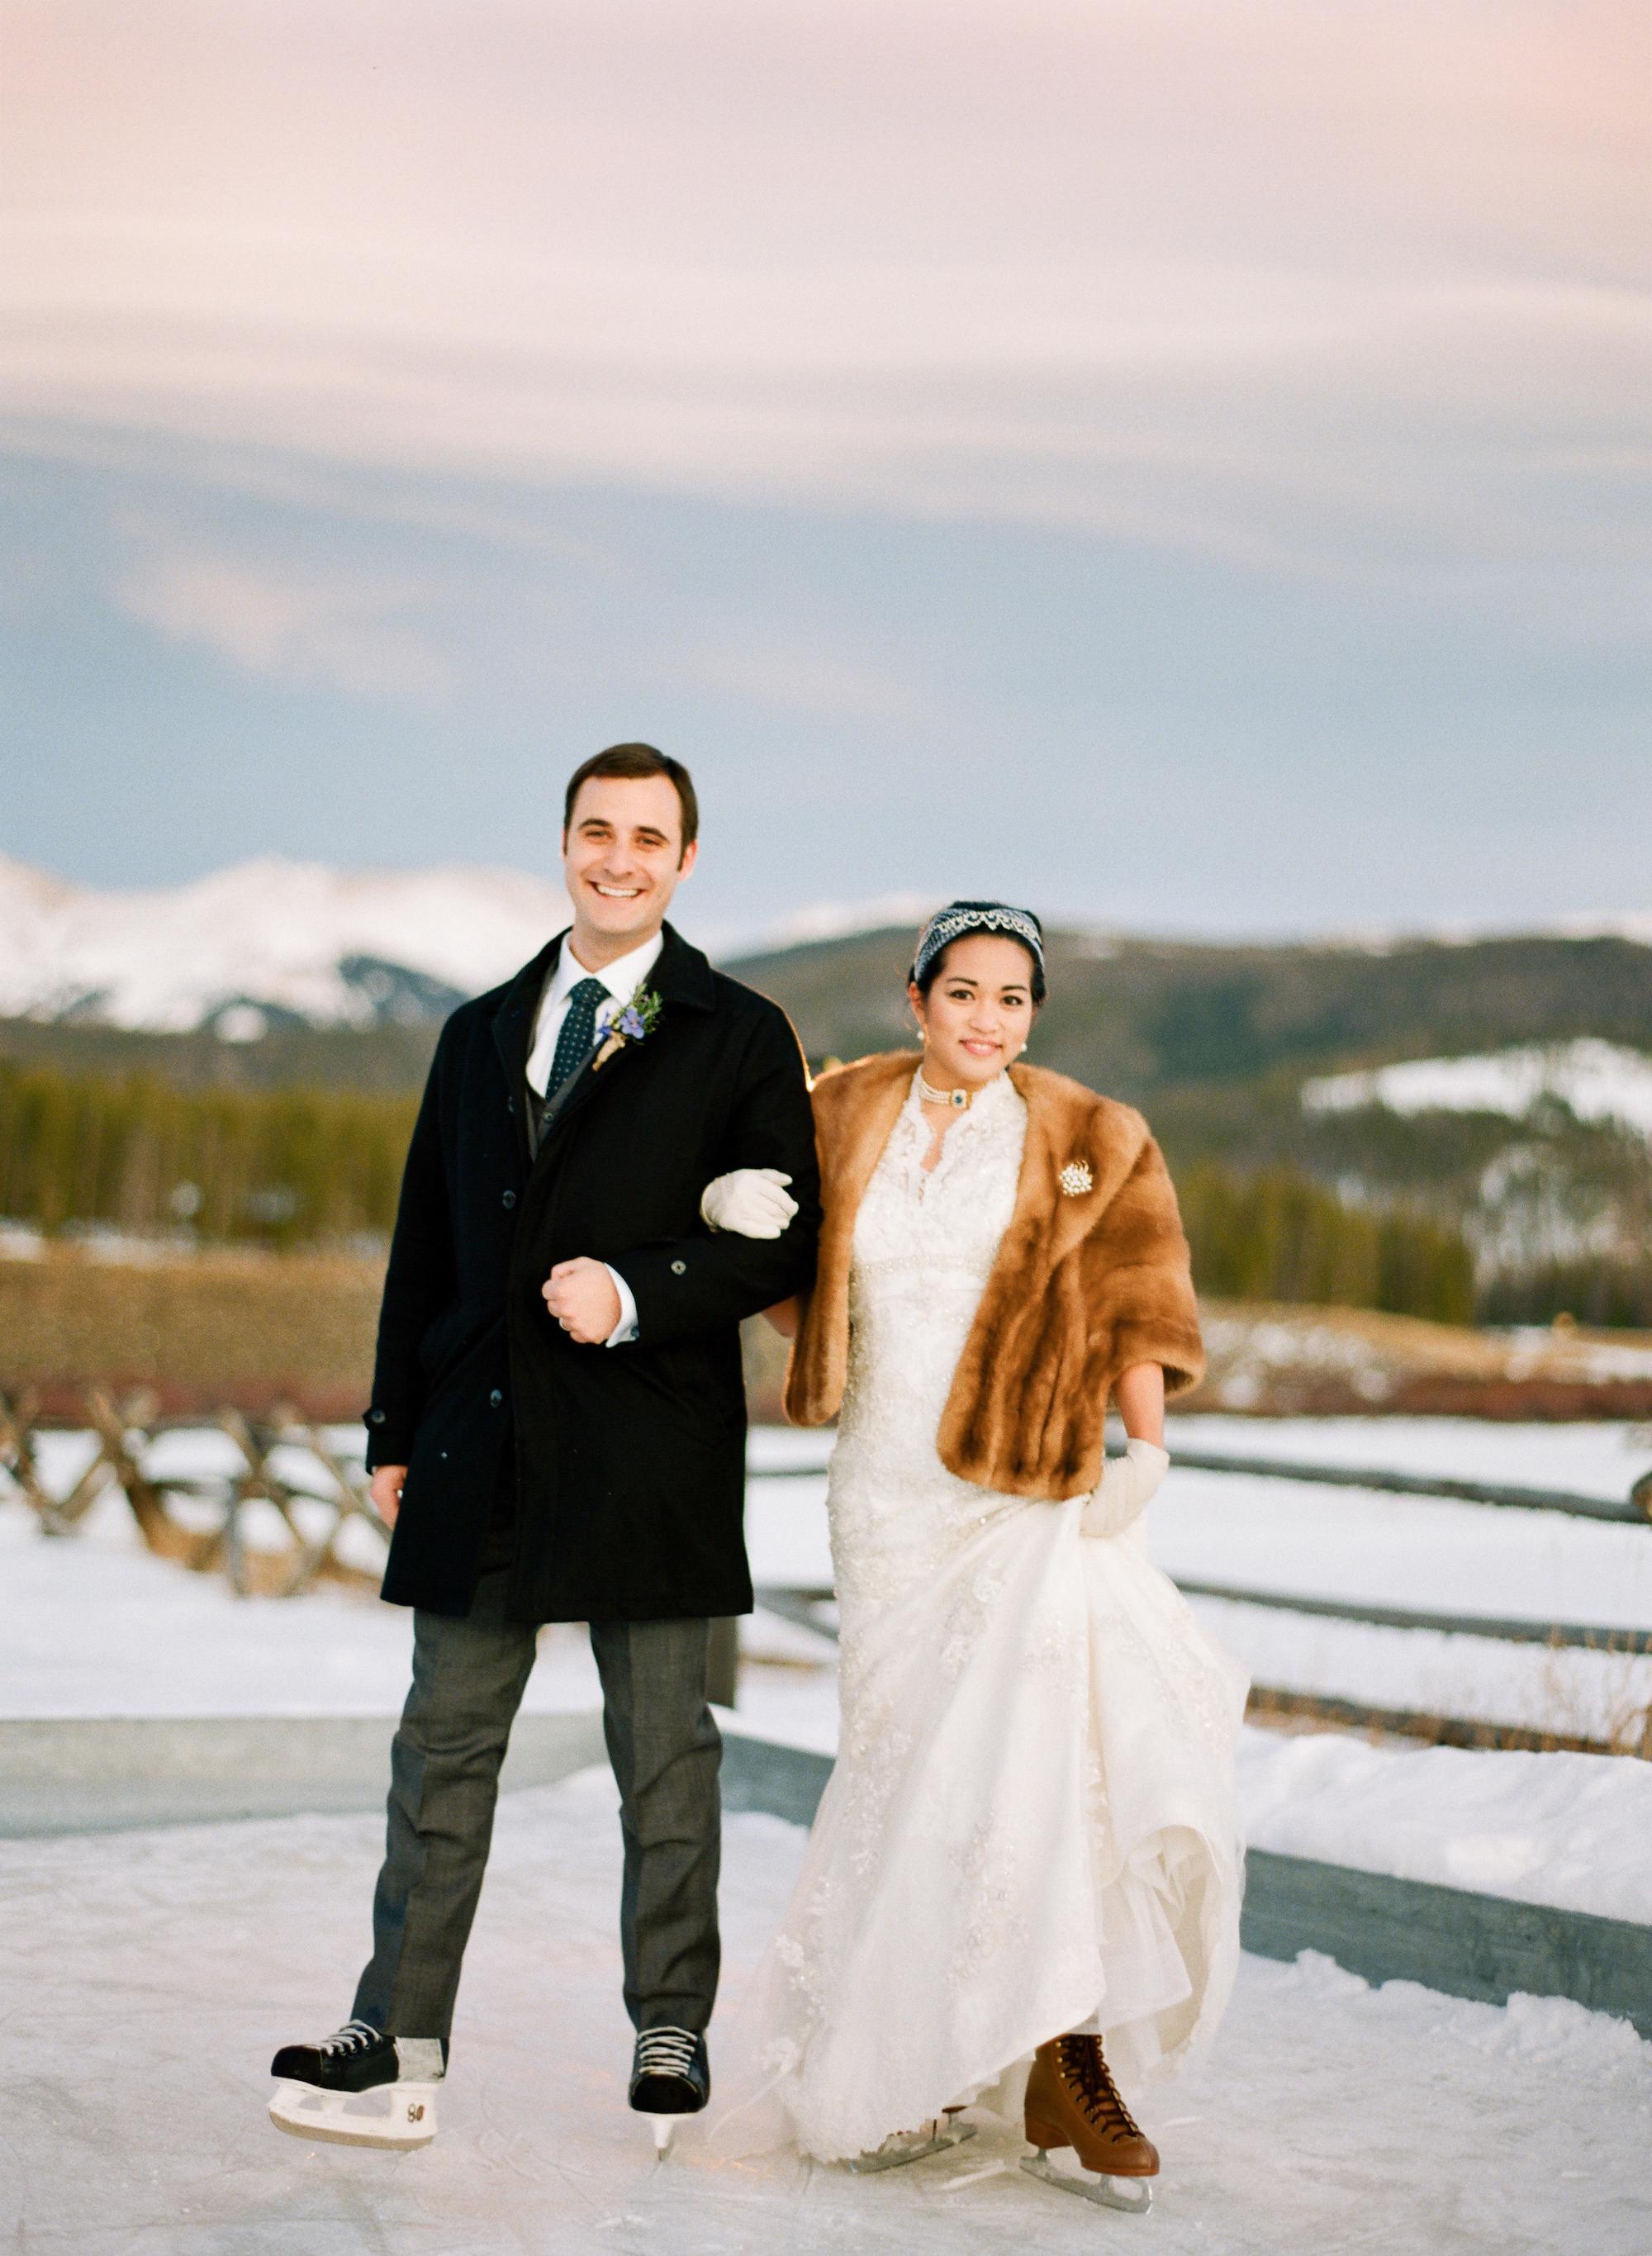 bride and groom ice skating